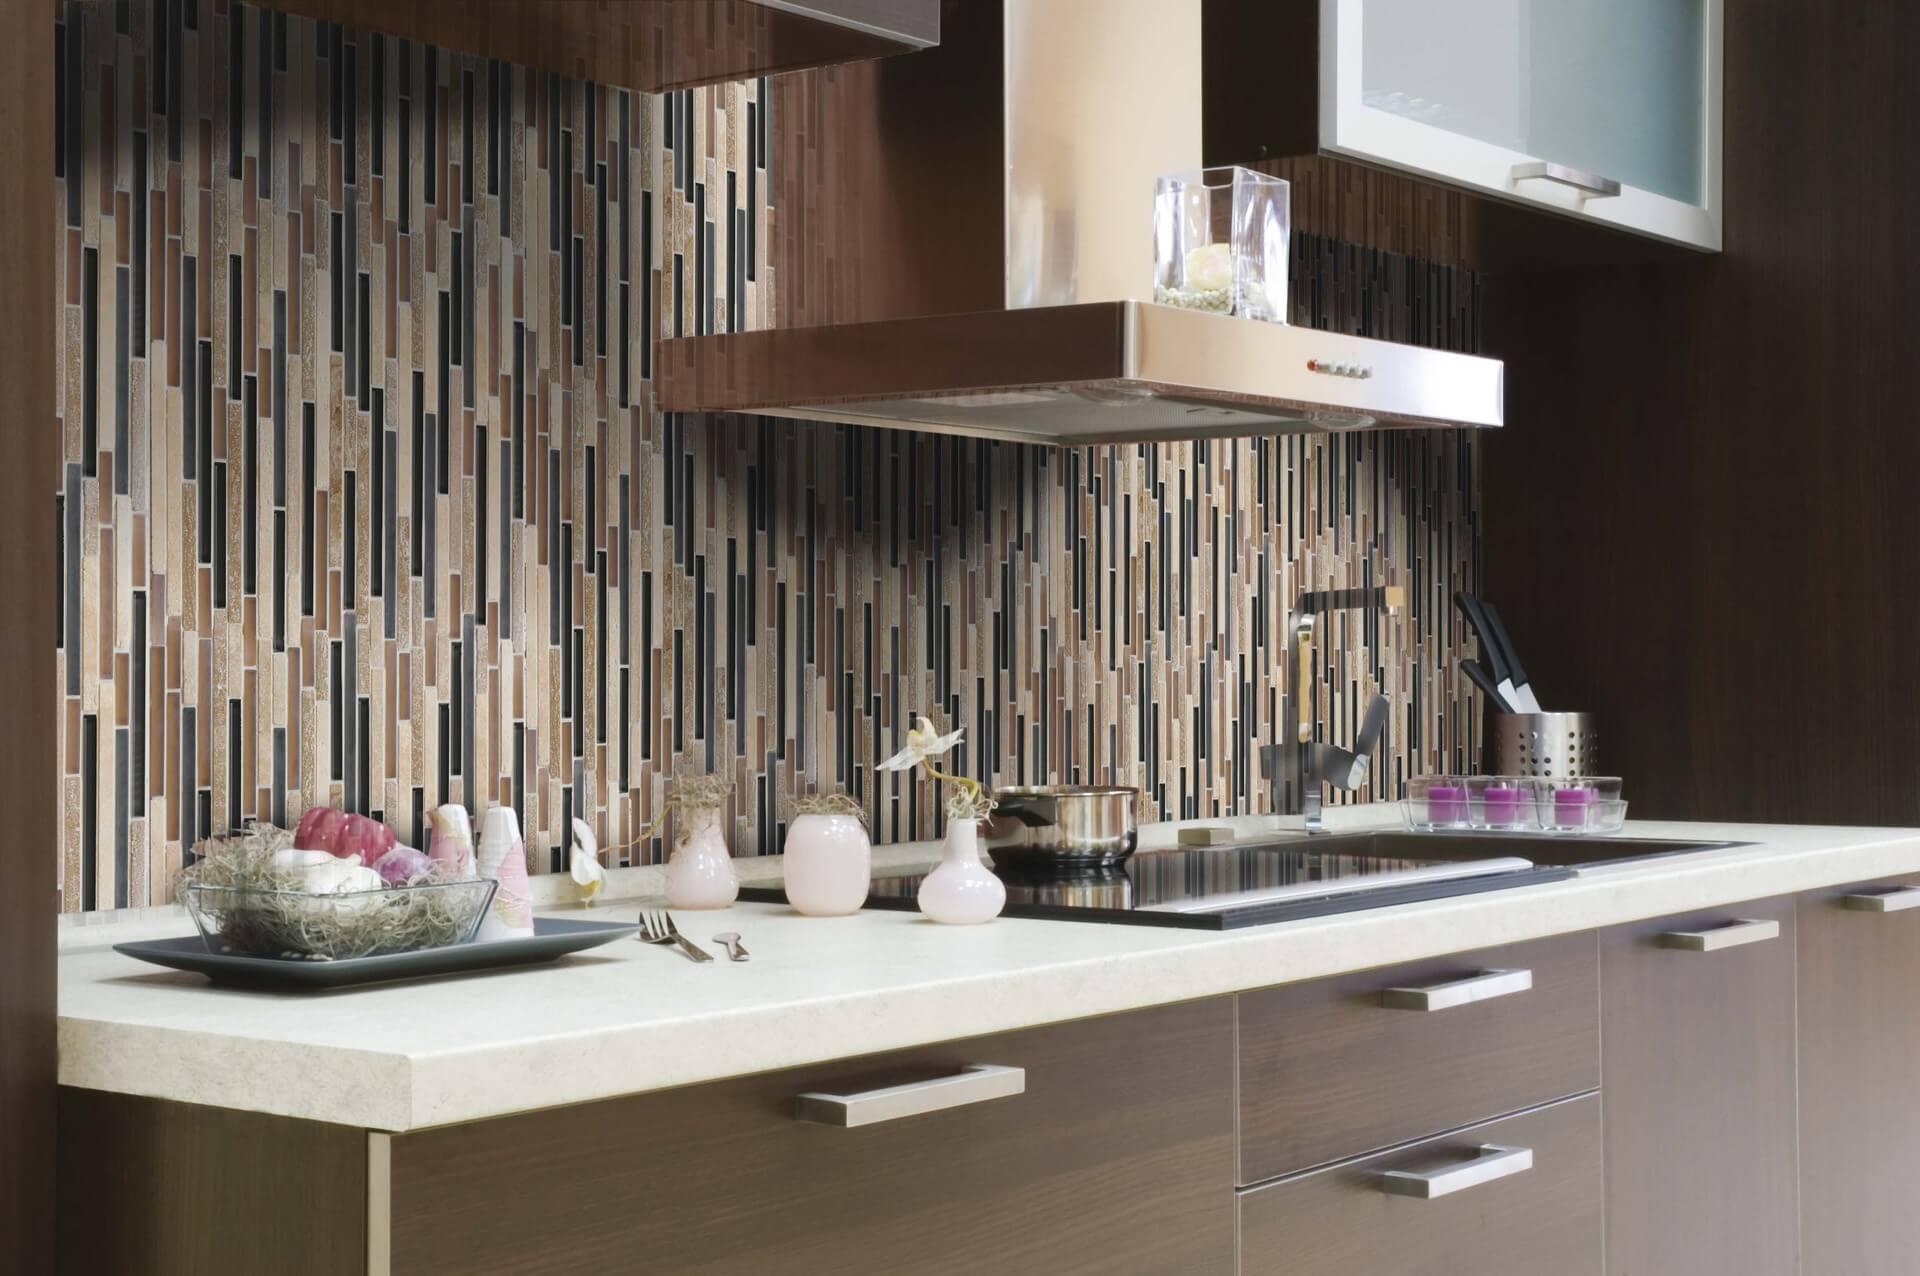 ice rocks hampton dunes 12x12 kitchen wall tiles design